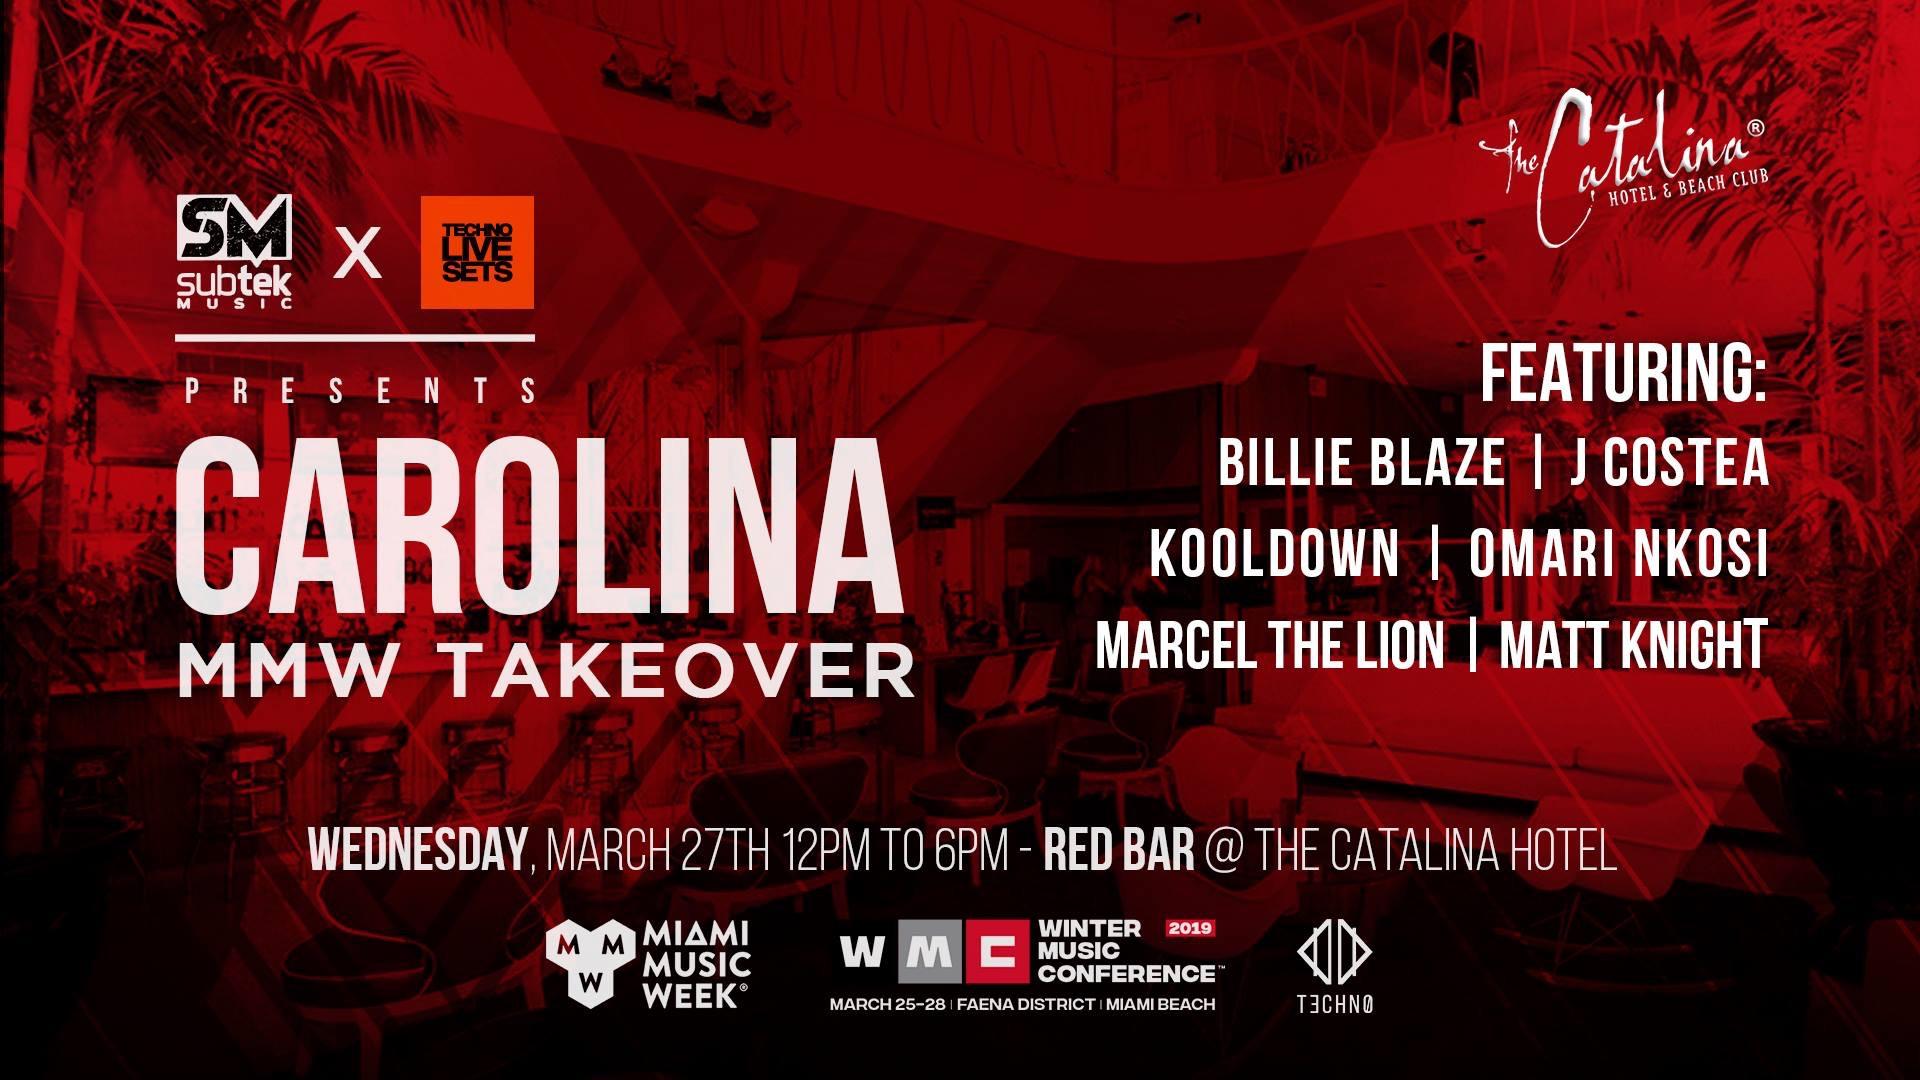 Subtek & Techno Live Sets Presents Carolina TakeOver Image